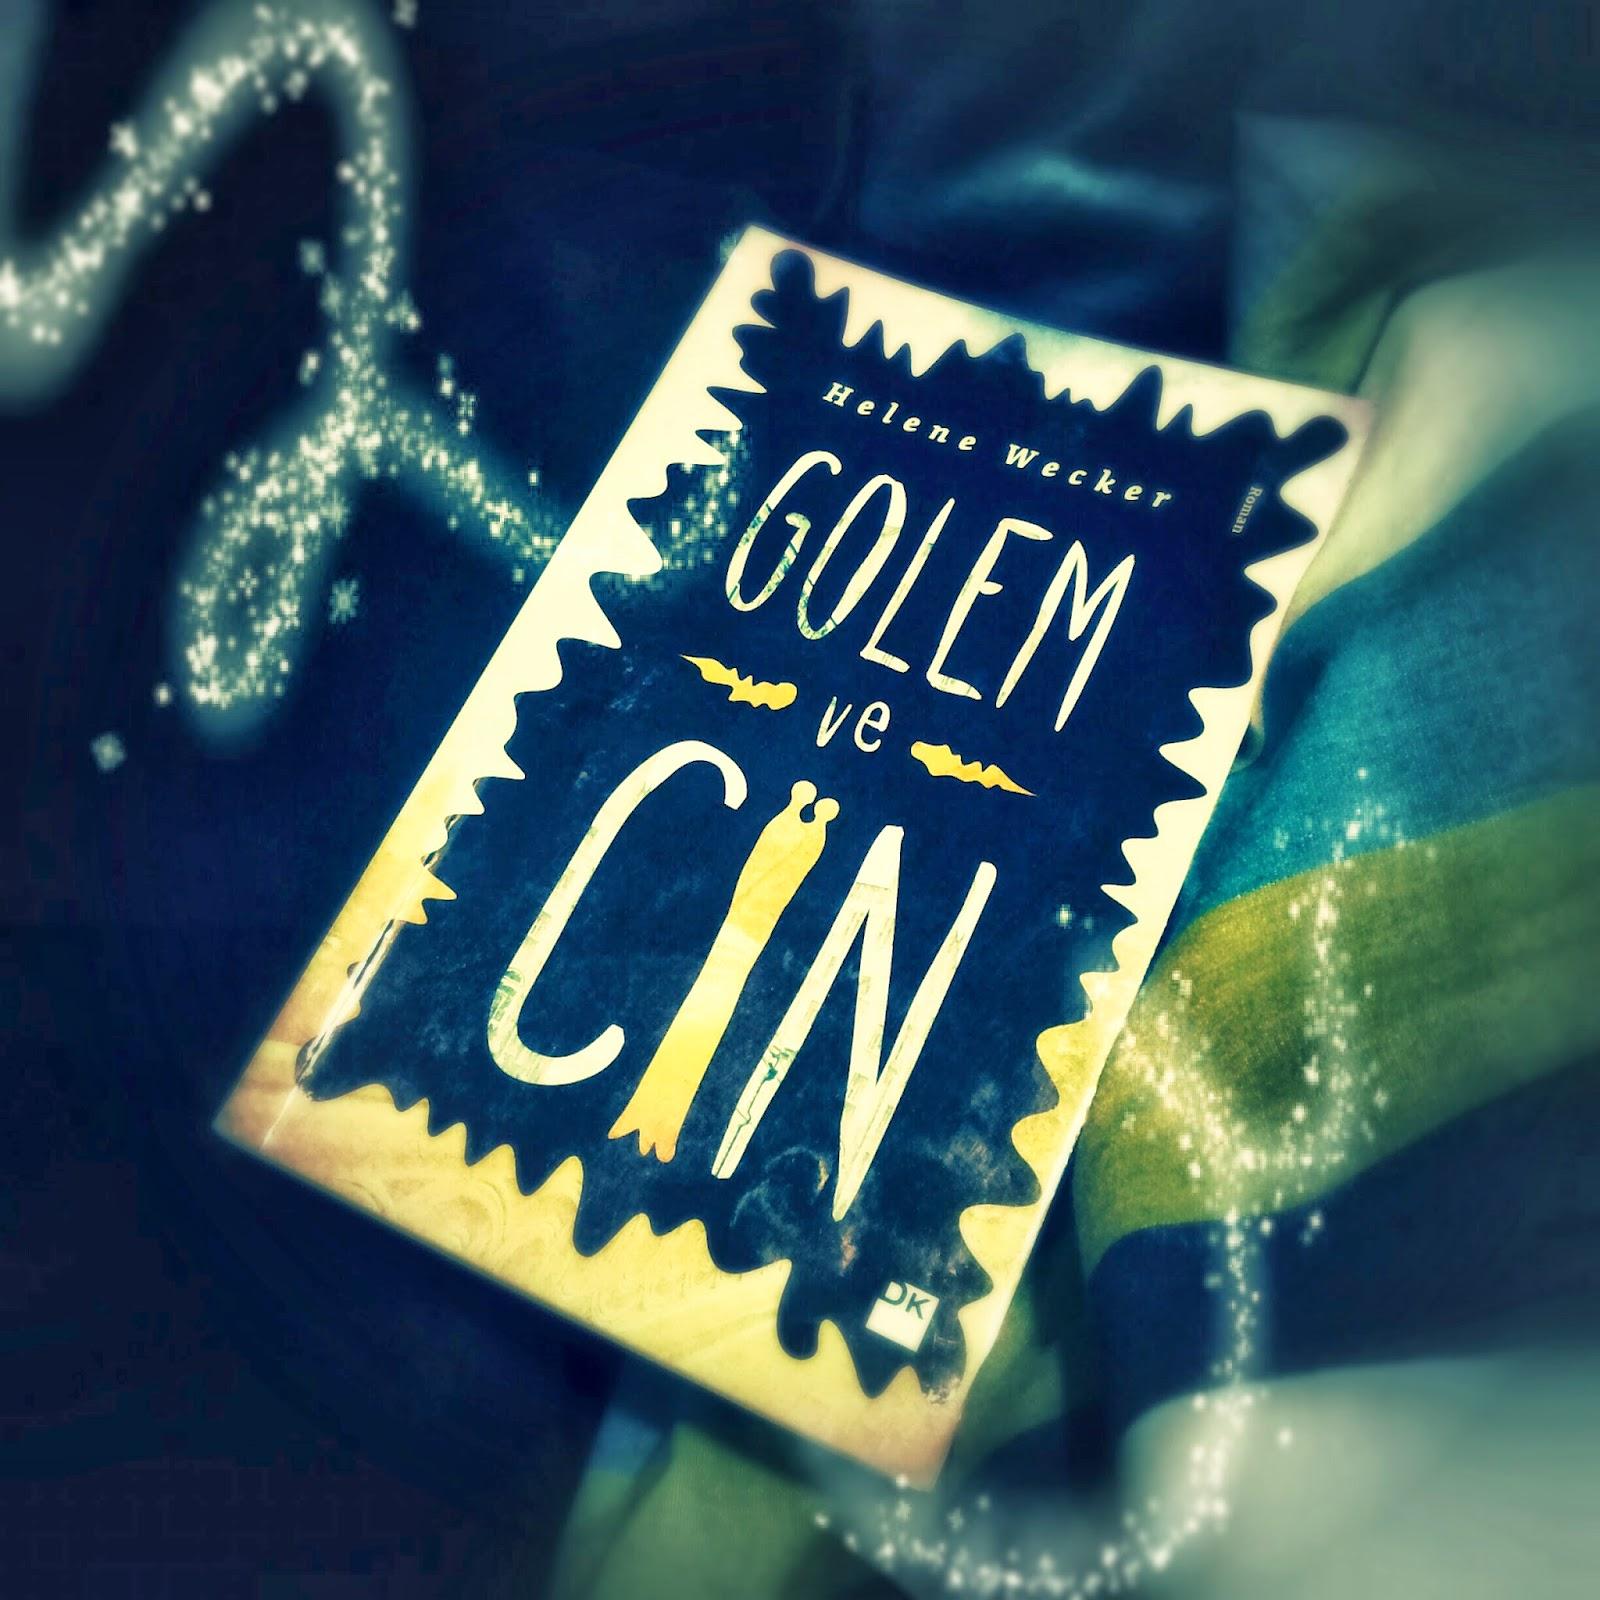 Helene Wecker | Golem ve Cin ★★★★★